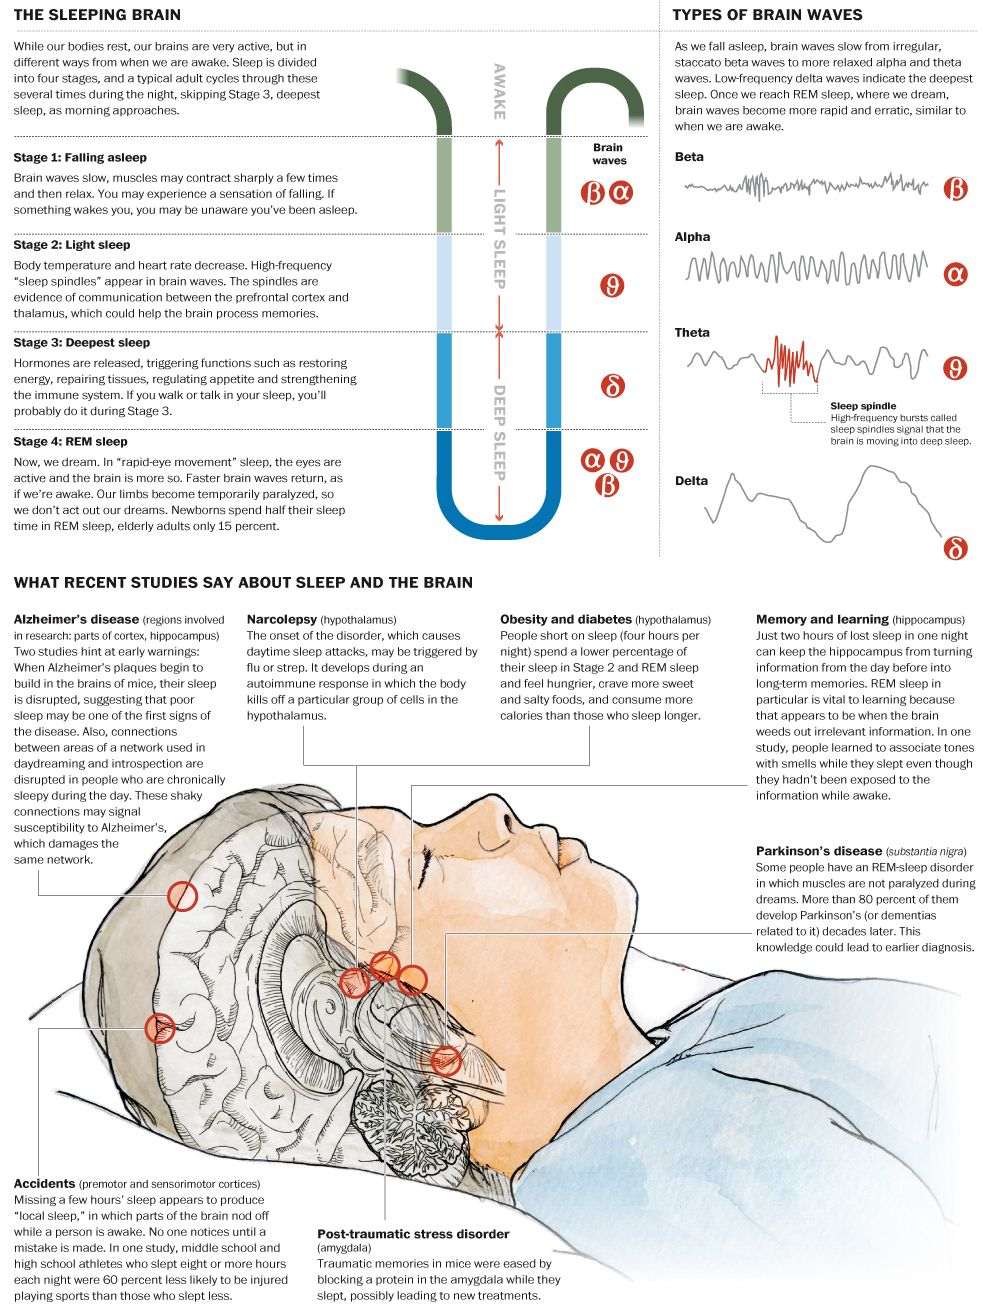 Disease and sleep: Recent studies find new links